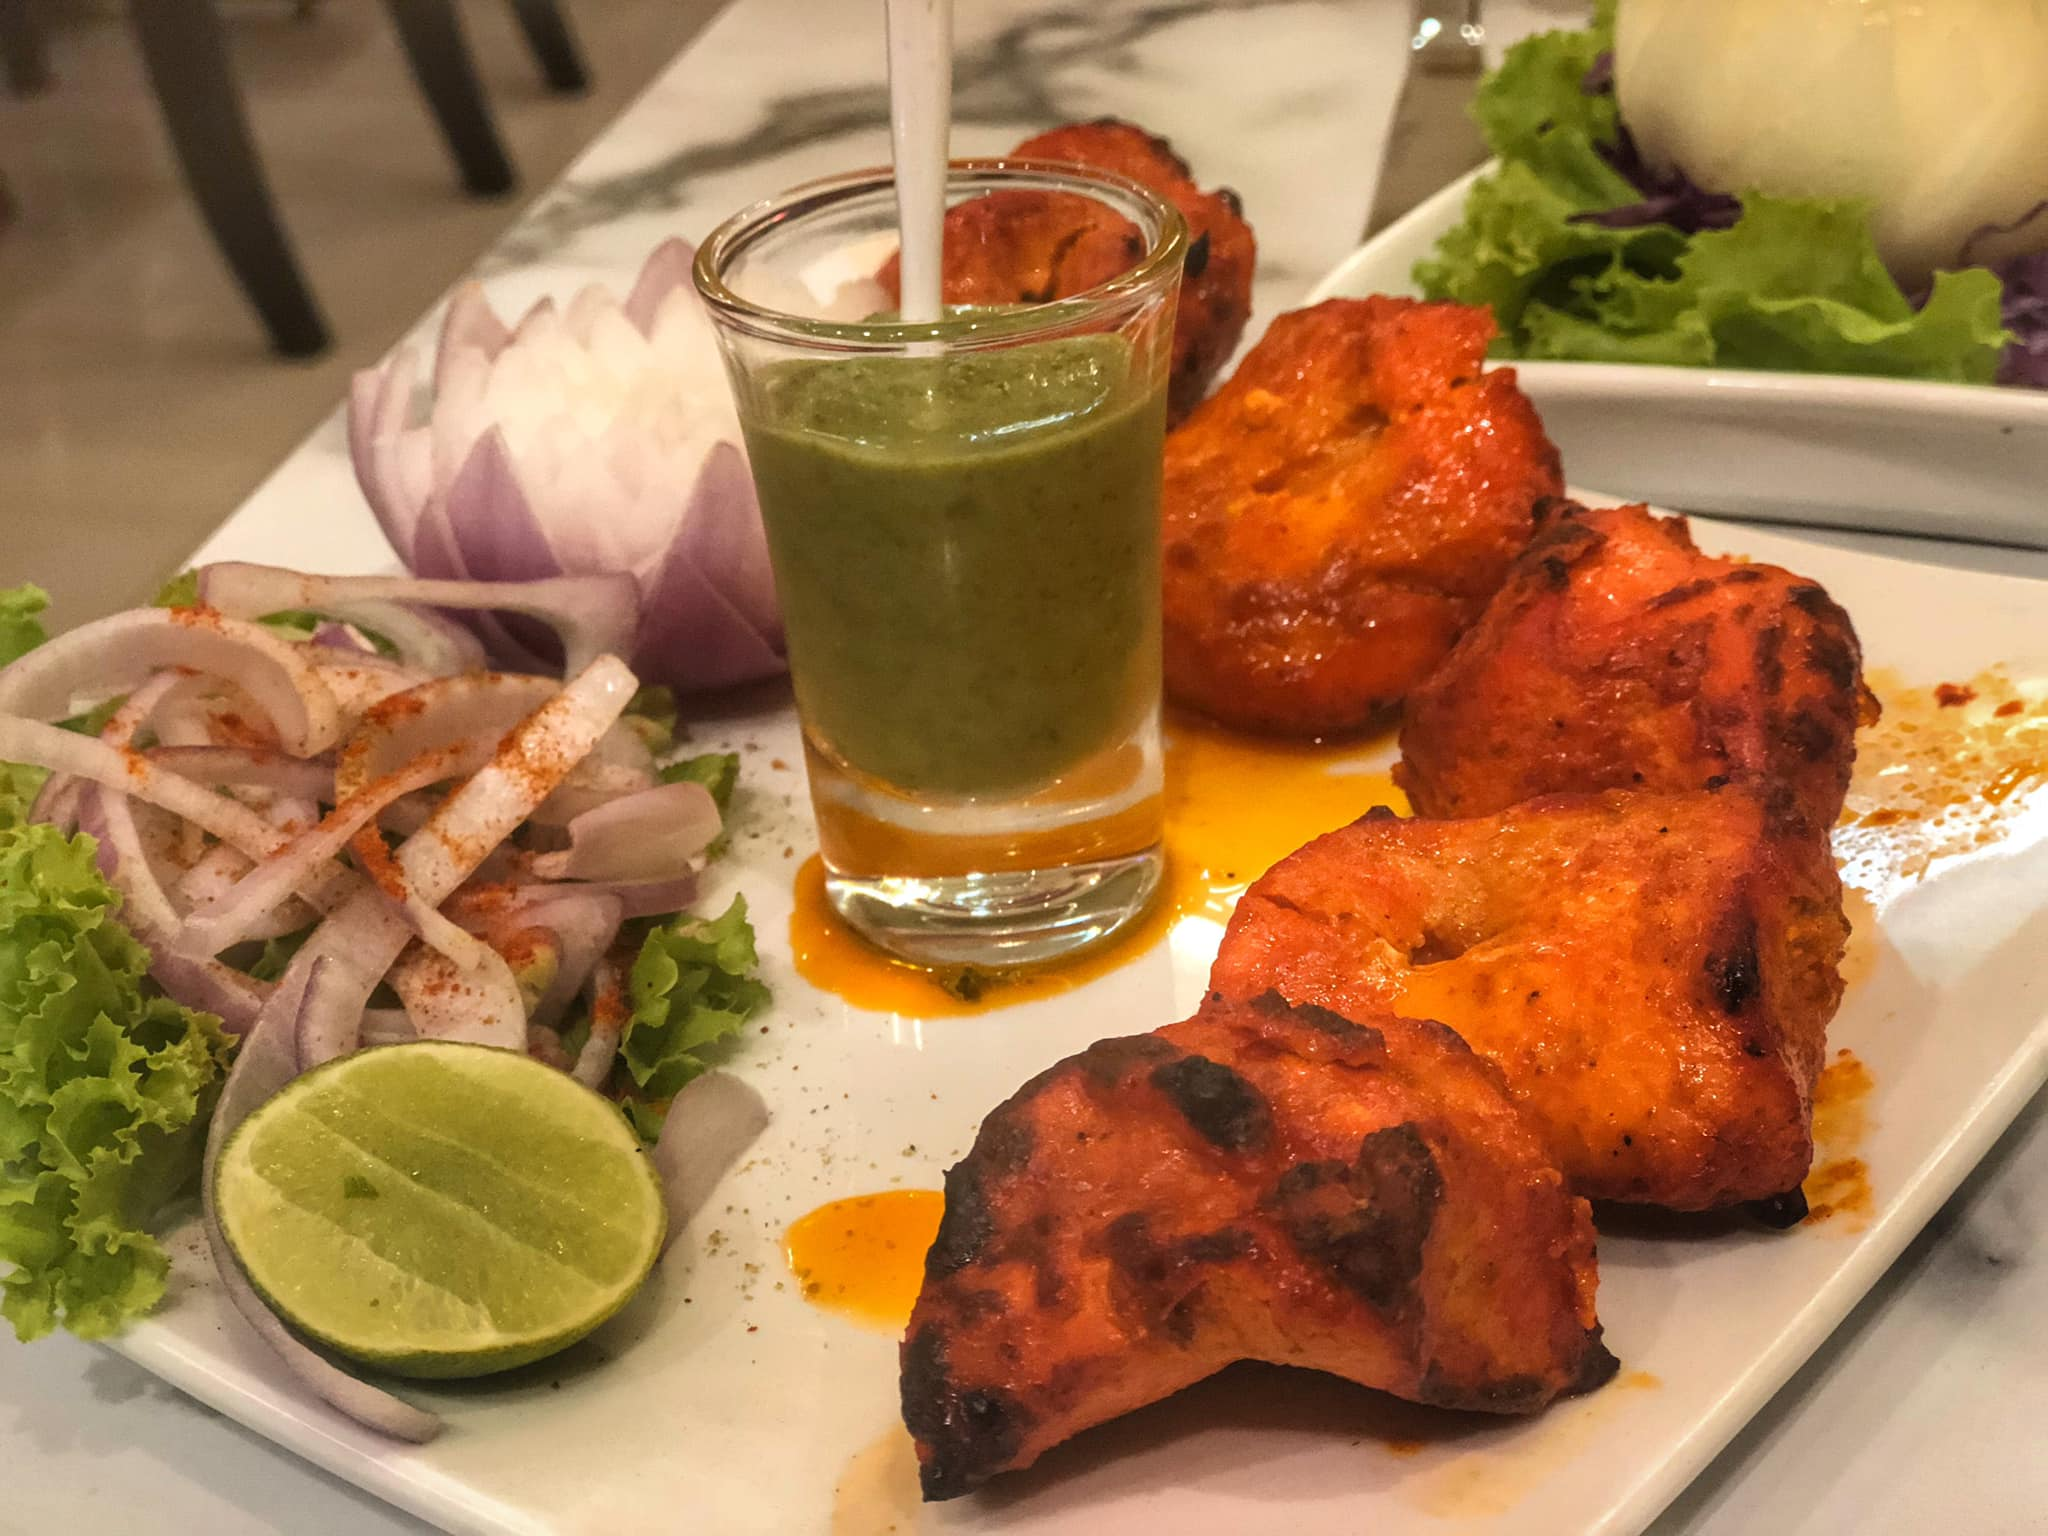 CHICKEN TIKKA MASALA INDIAN FOOD RESTAURANT UDON THANI THAILAND